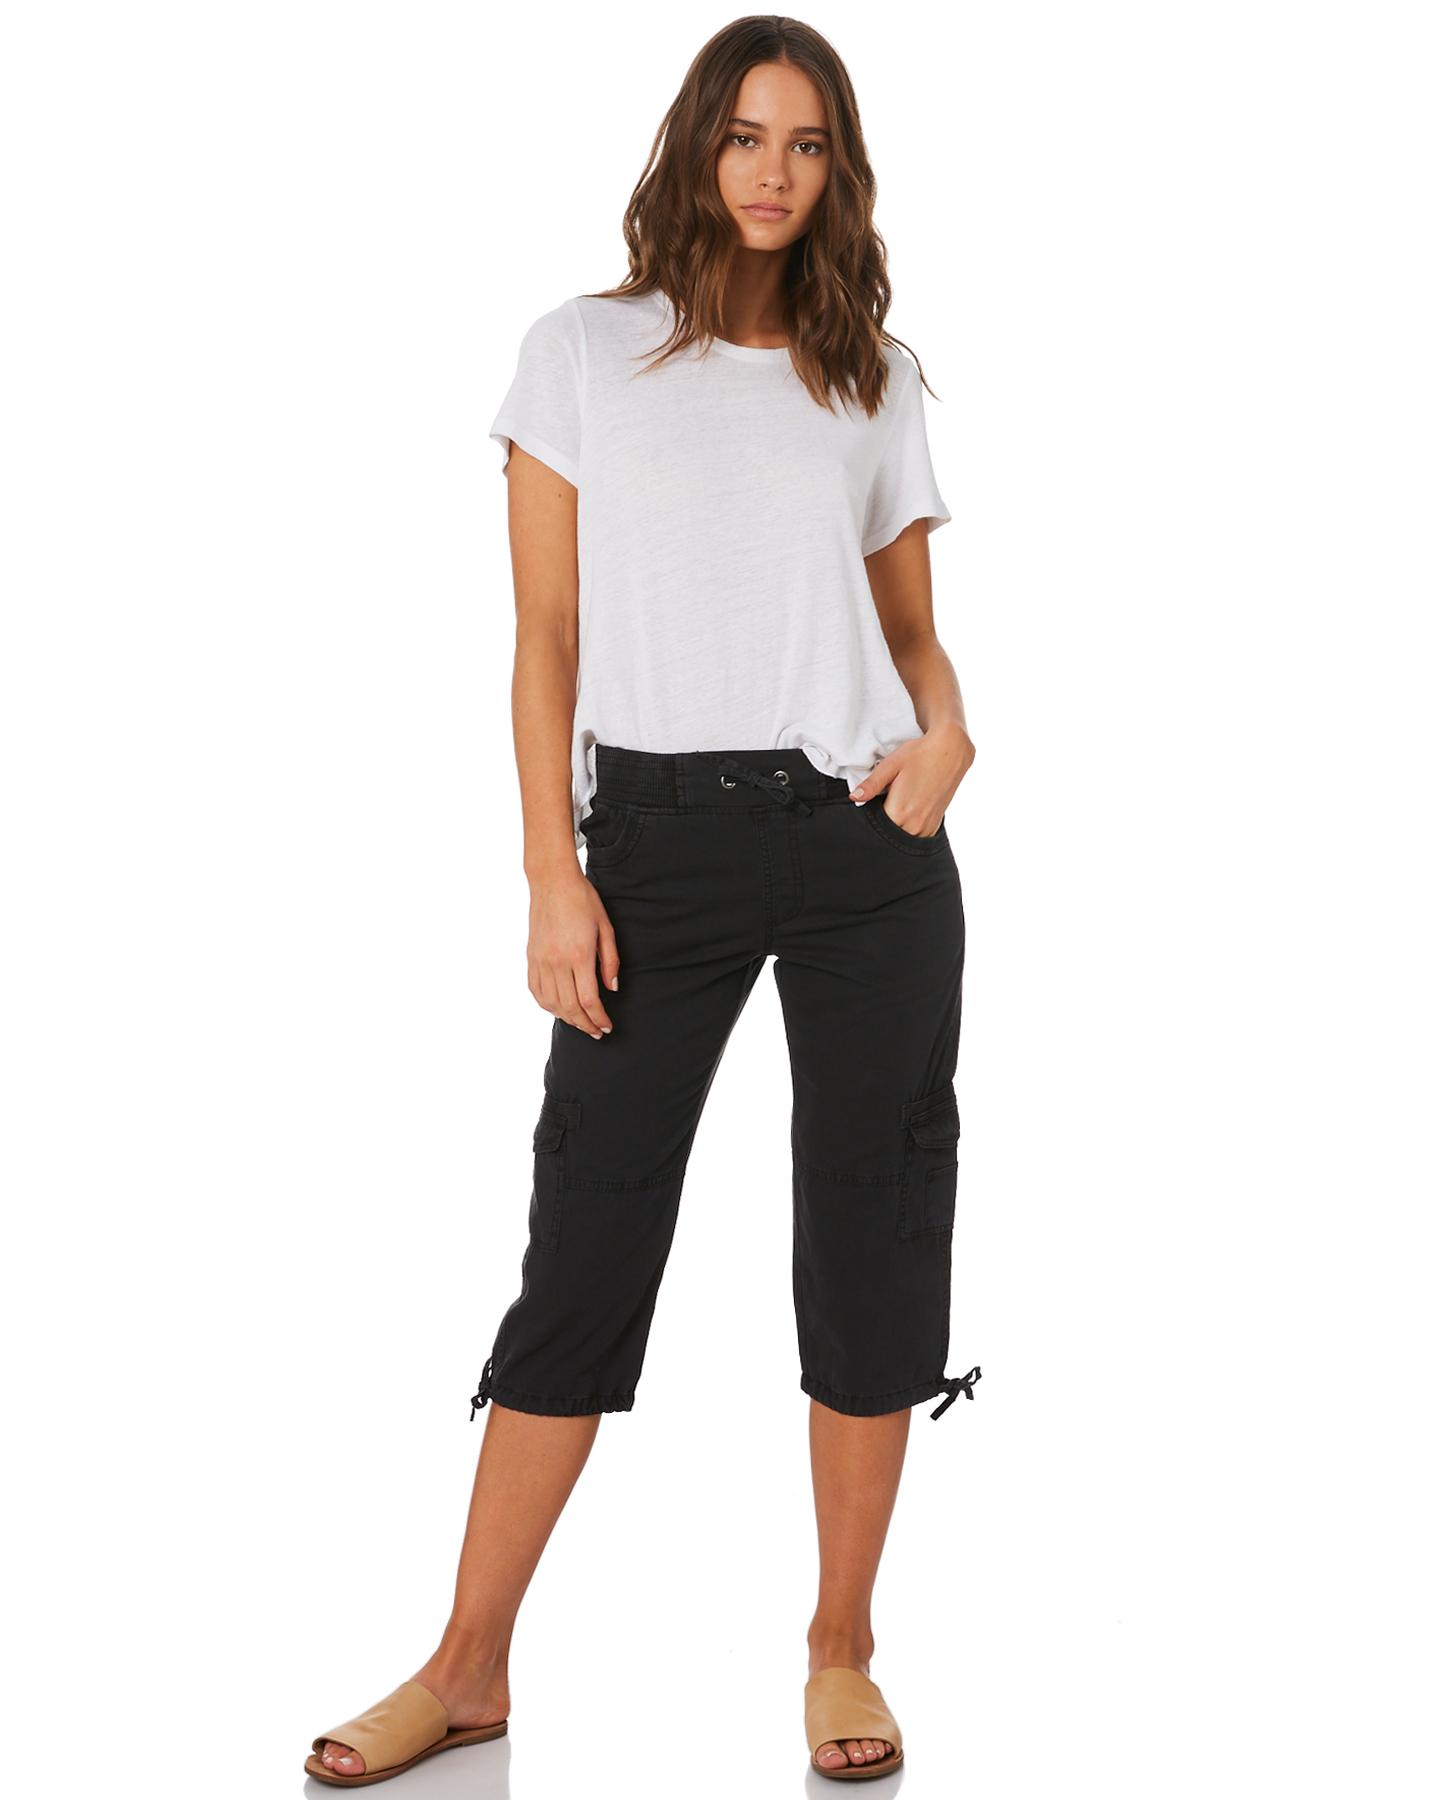 New-Swell-Women-039-s-Mayfair-3-4-Cargo-Pant-Cotton-Green thumbnail 15